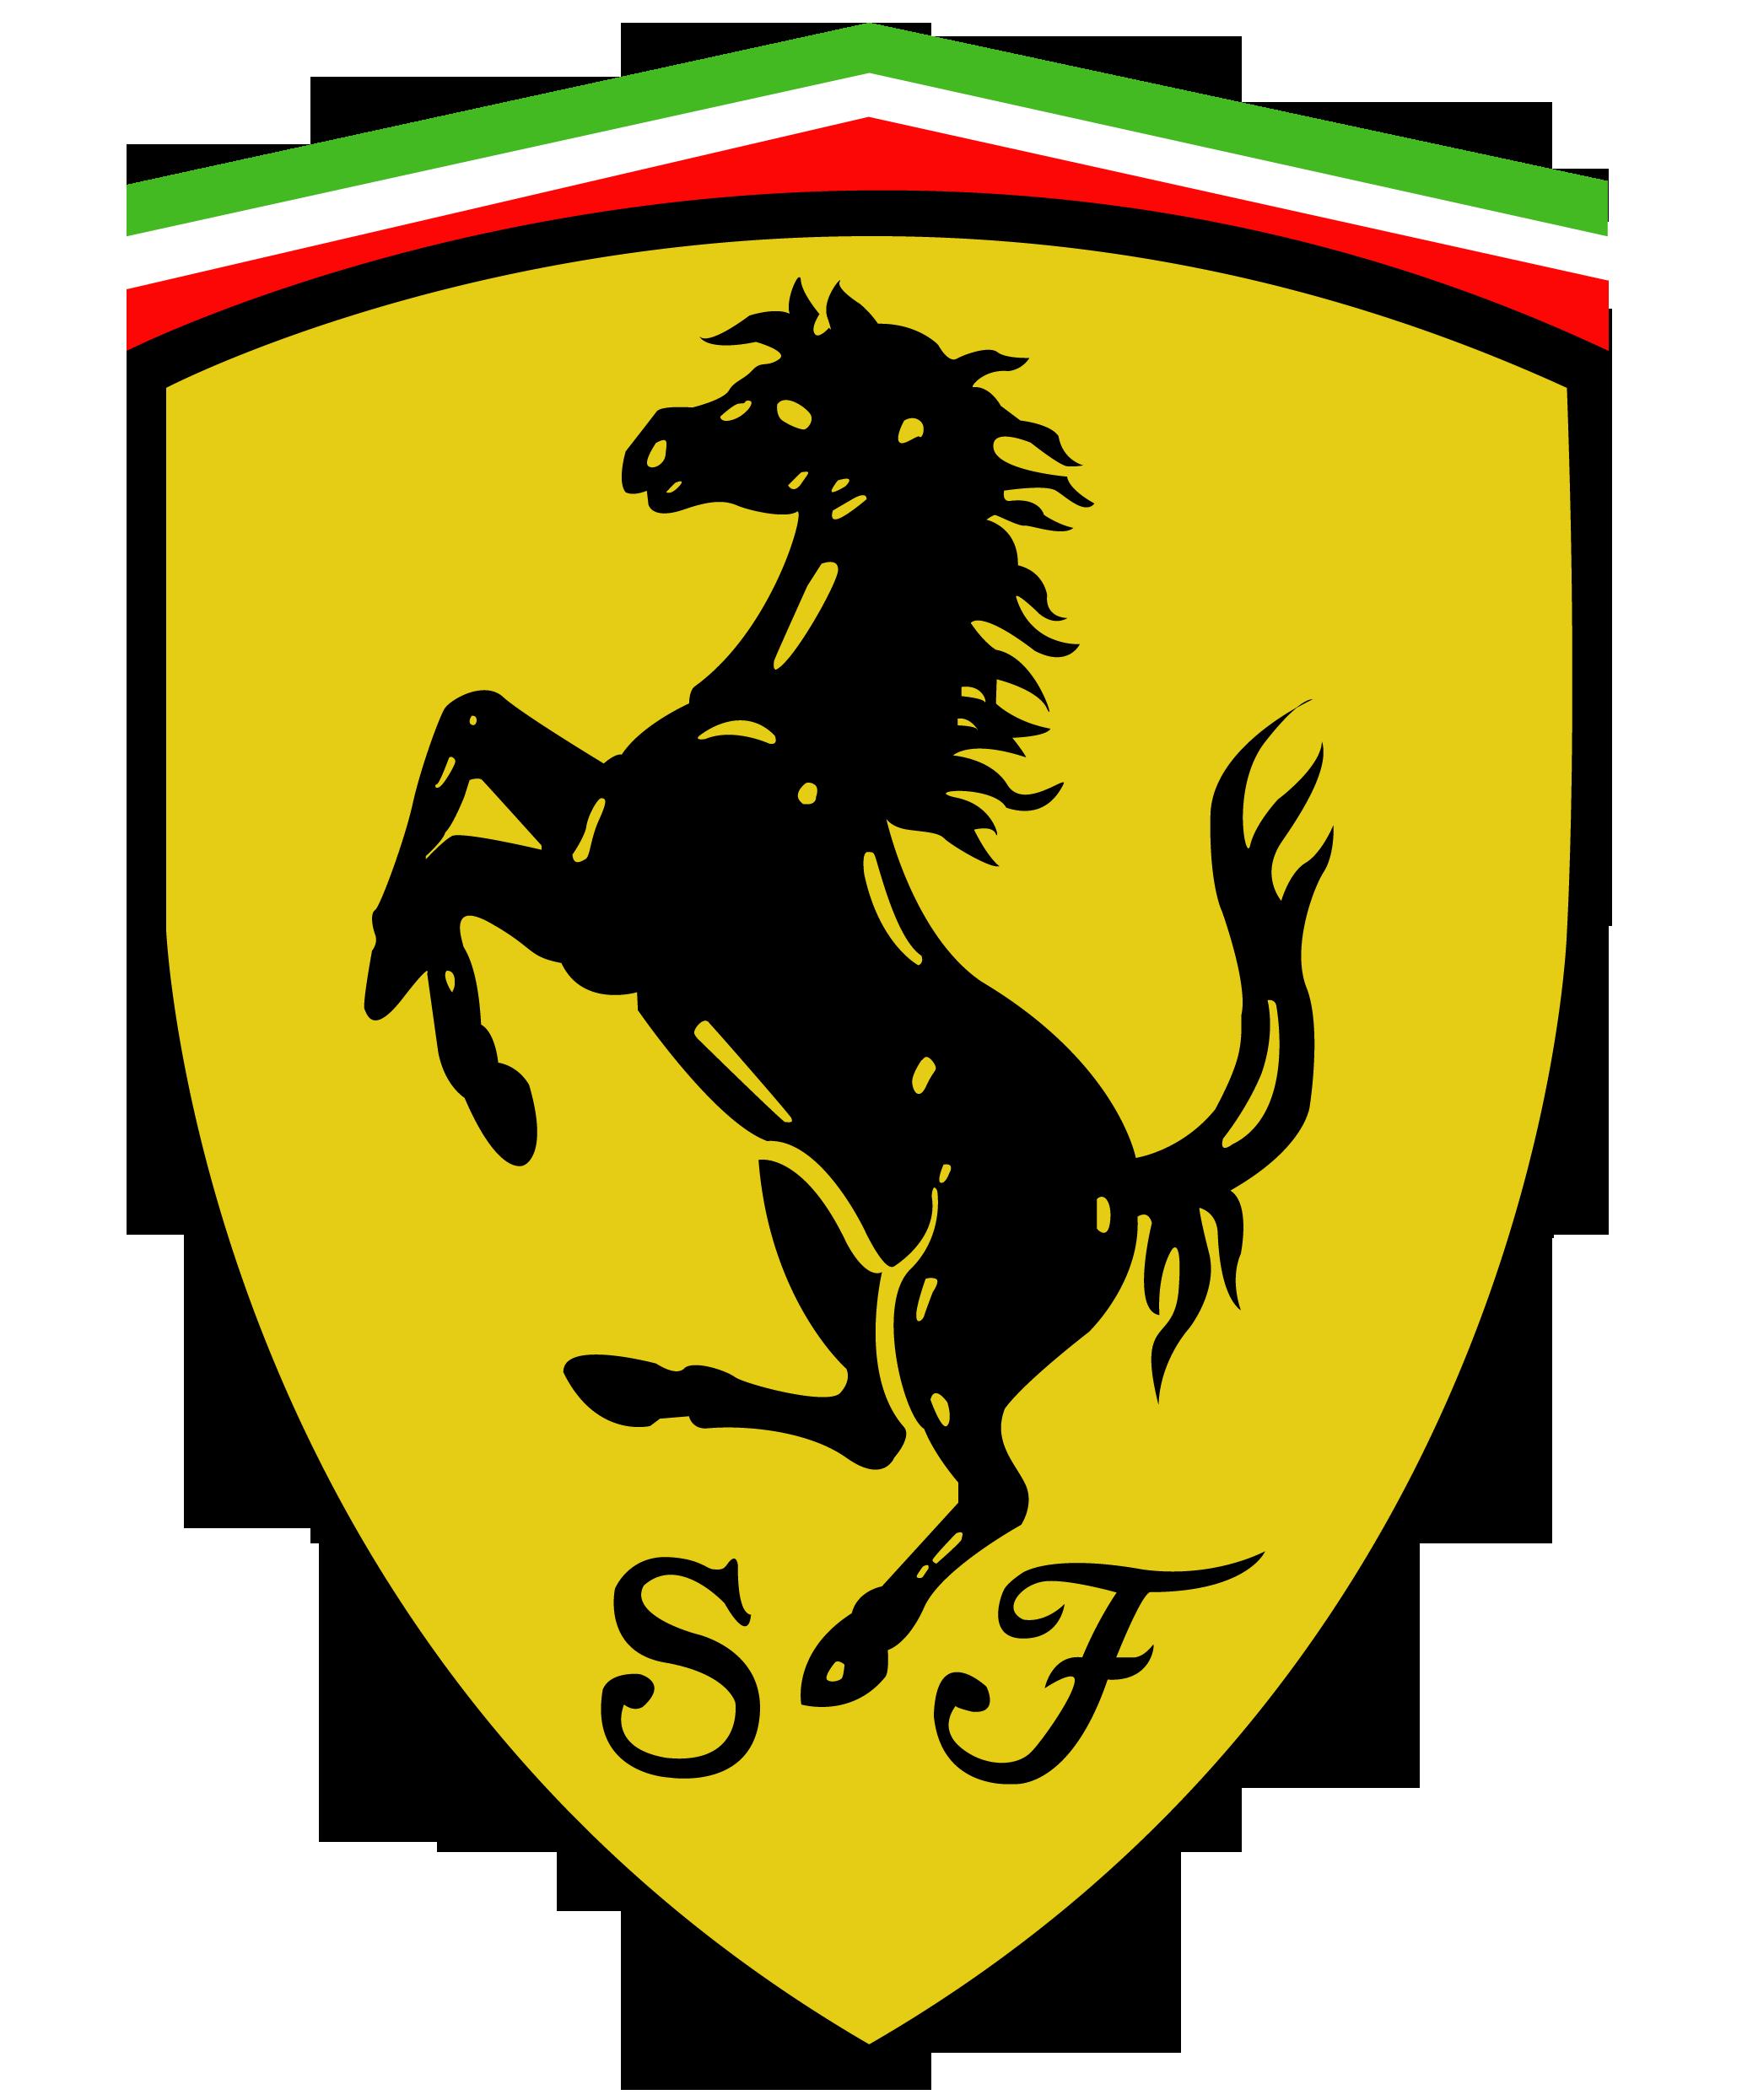 Ferrari logos eliteluxury gd 140 pinterest ferrari cars buycottarizona